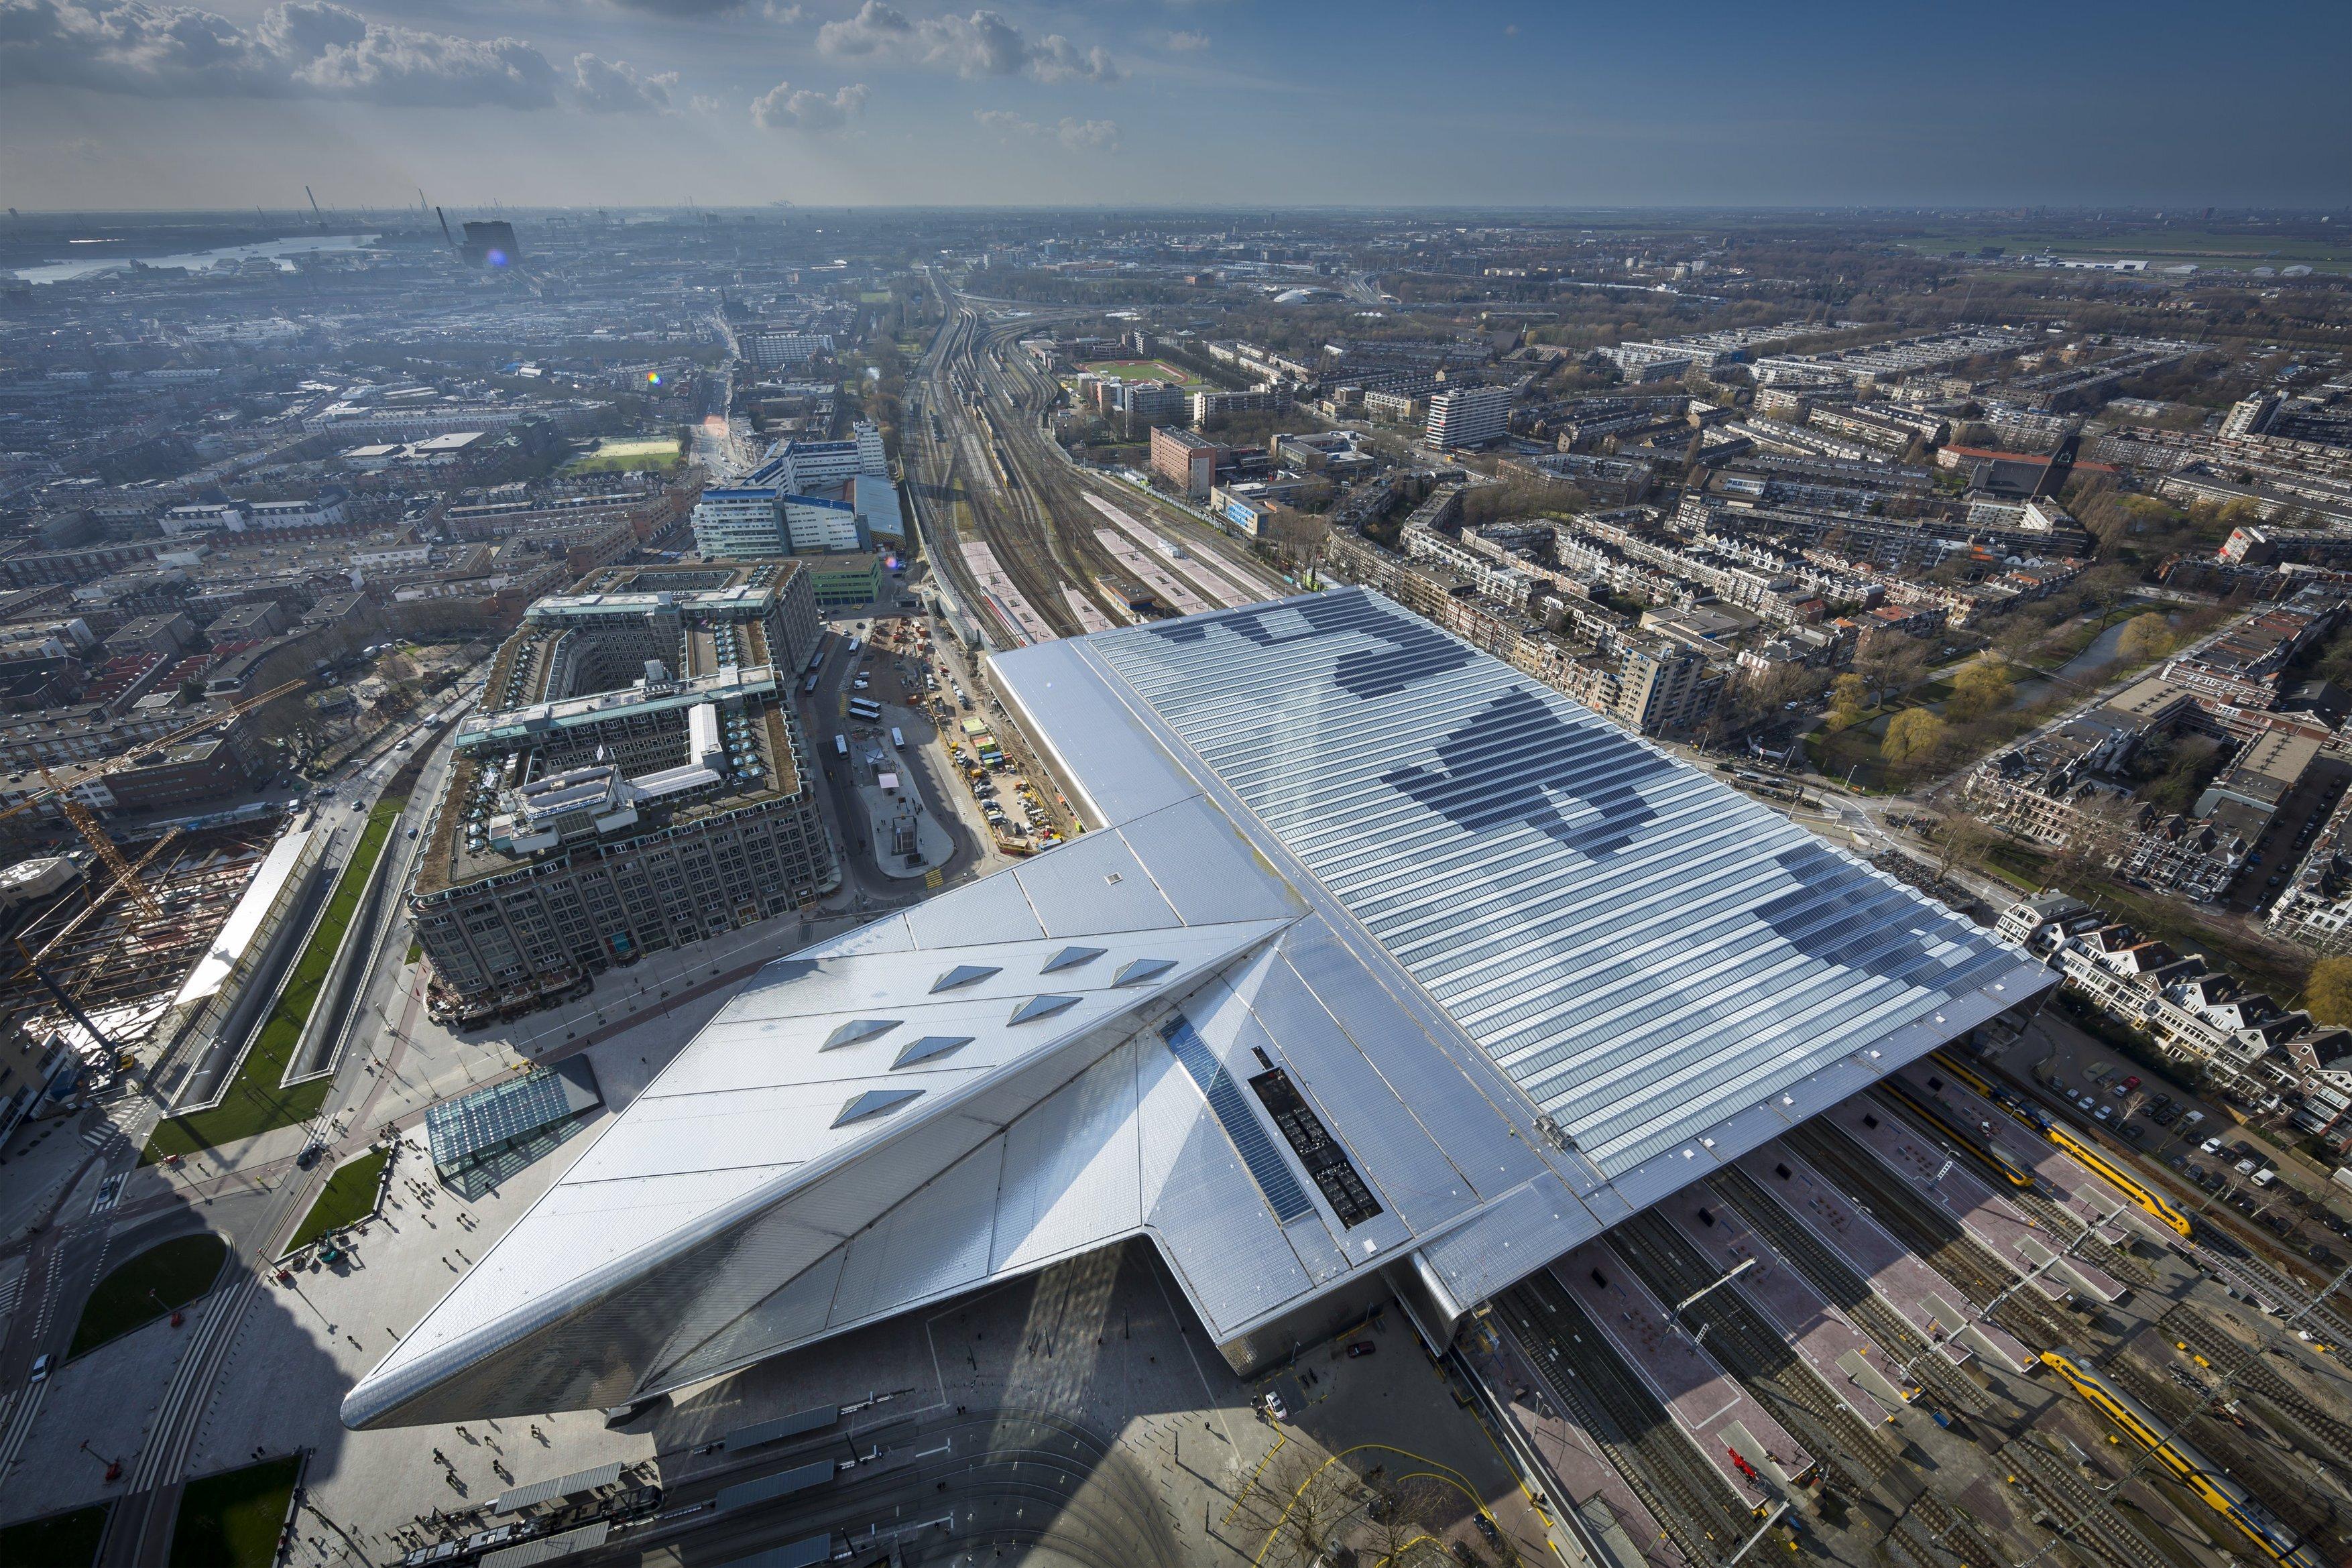 480 Rotterdam Centraal Station Team CS Benthem Crouwel Jannes Linders N21 a4